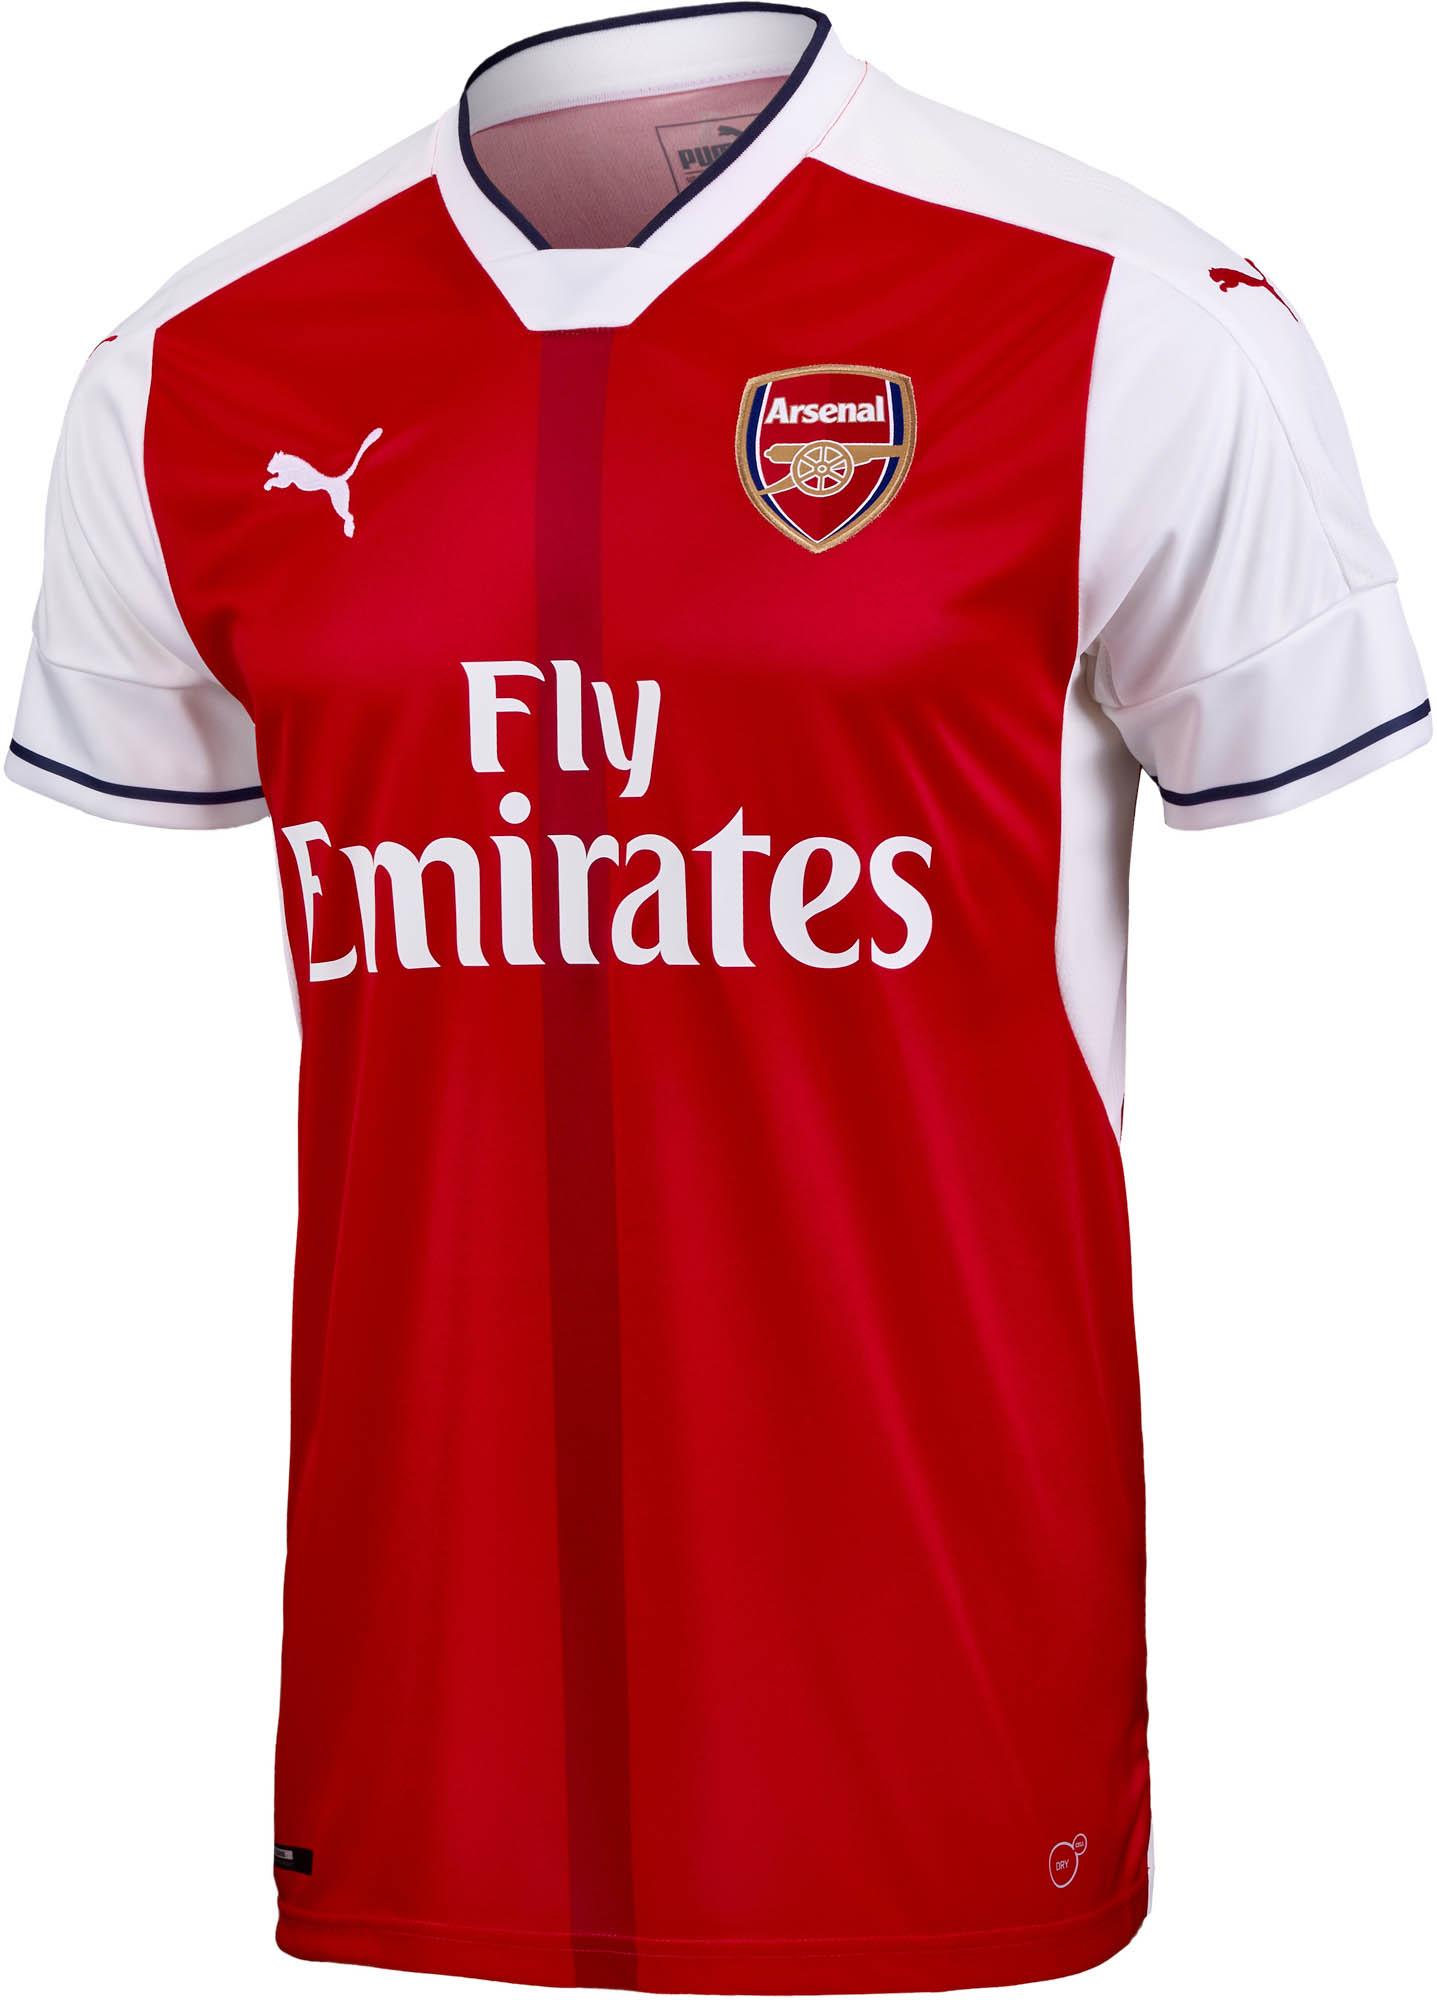 Puma Arsenal Home Jersey 2016 Arsenal Soccer Jerseys